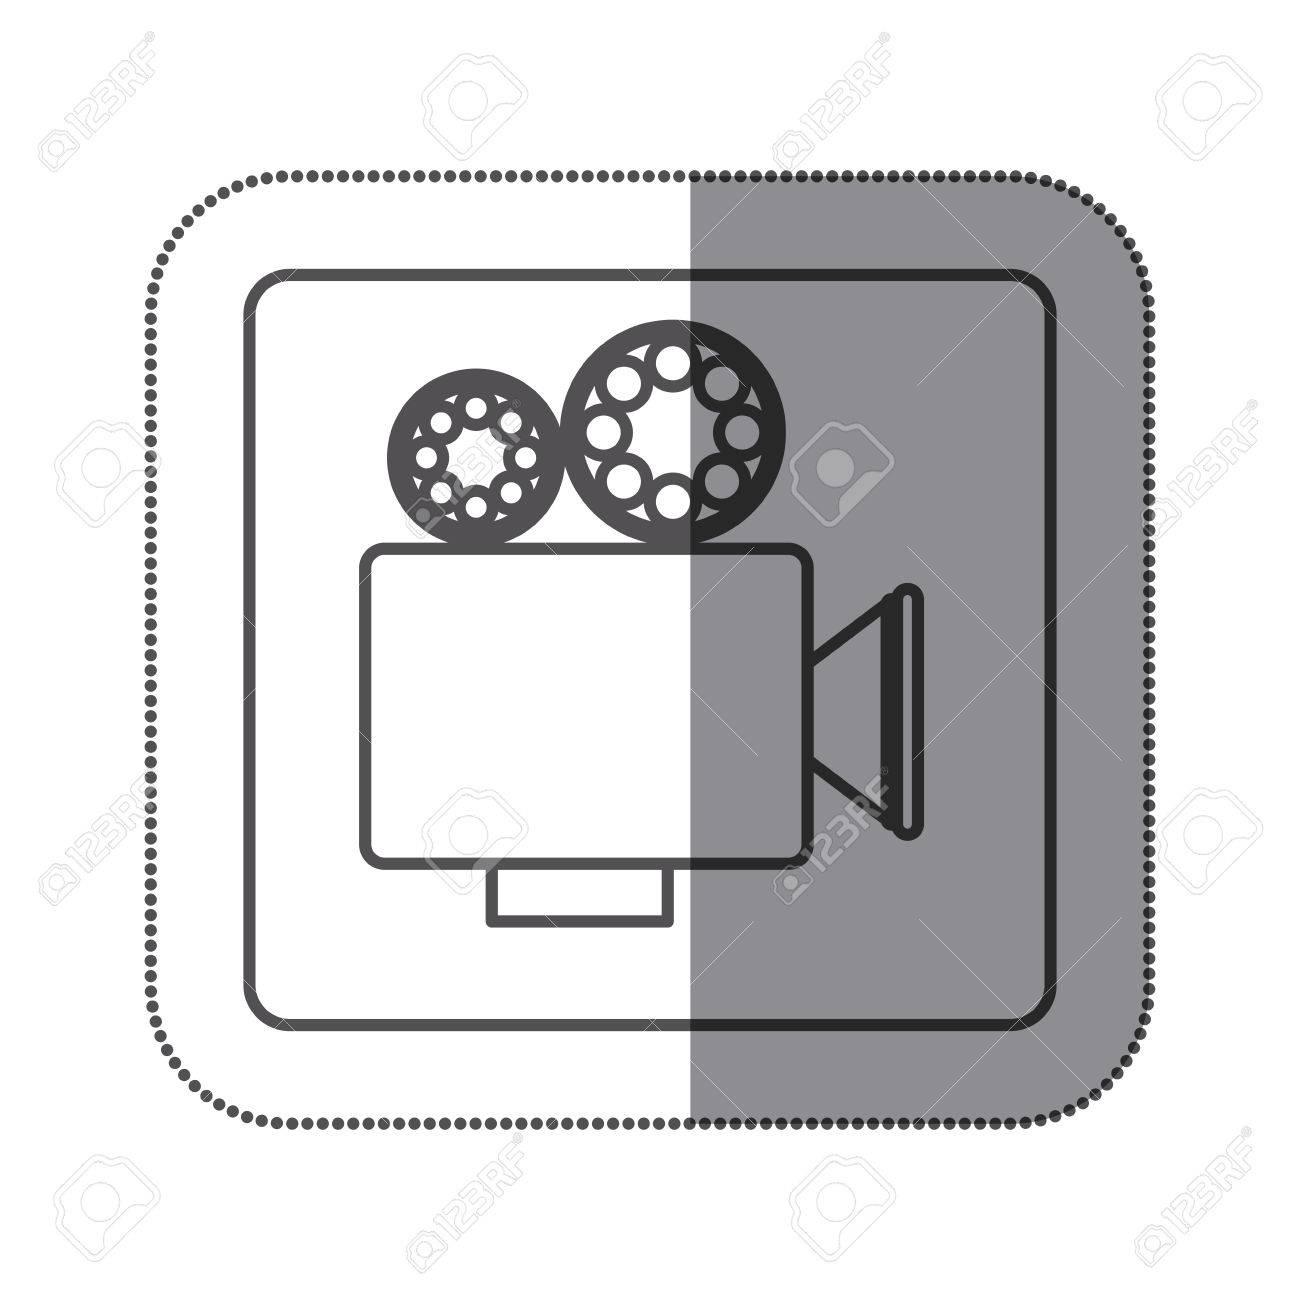 Sticker Silhouette Square Shape With Retro Movie Projector Vector ...